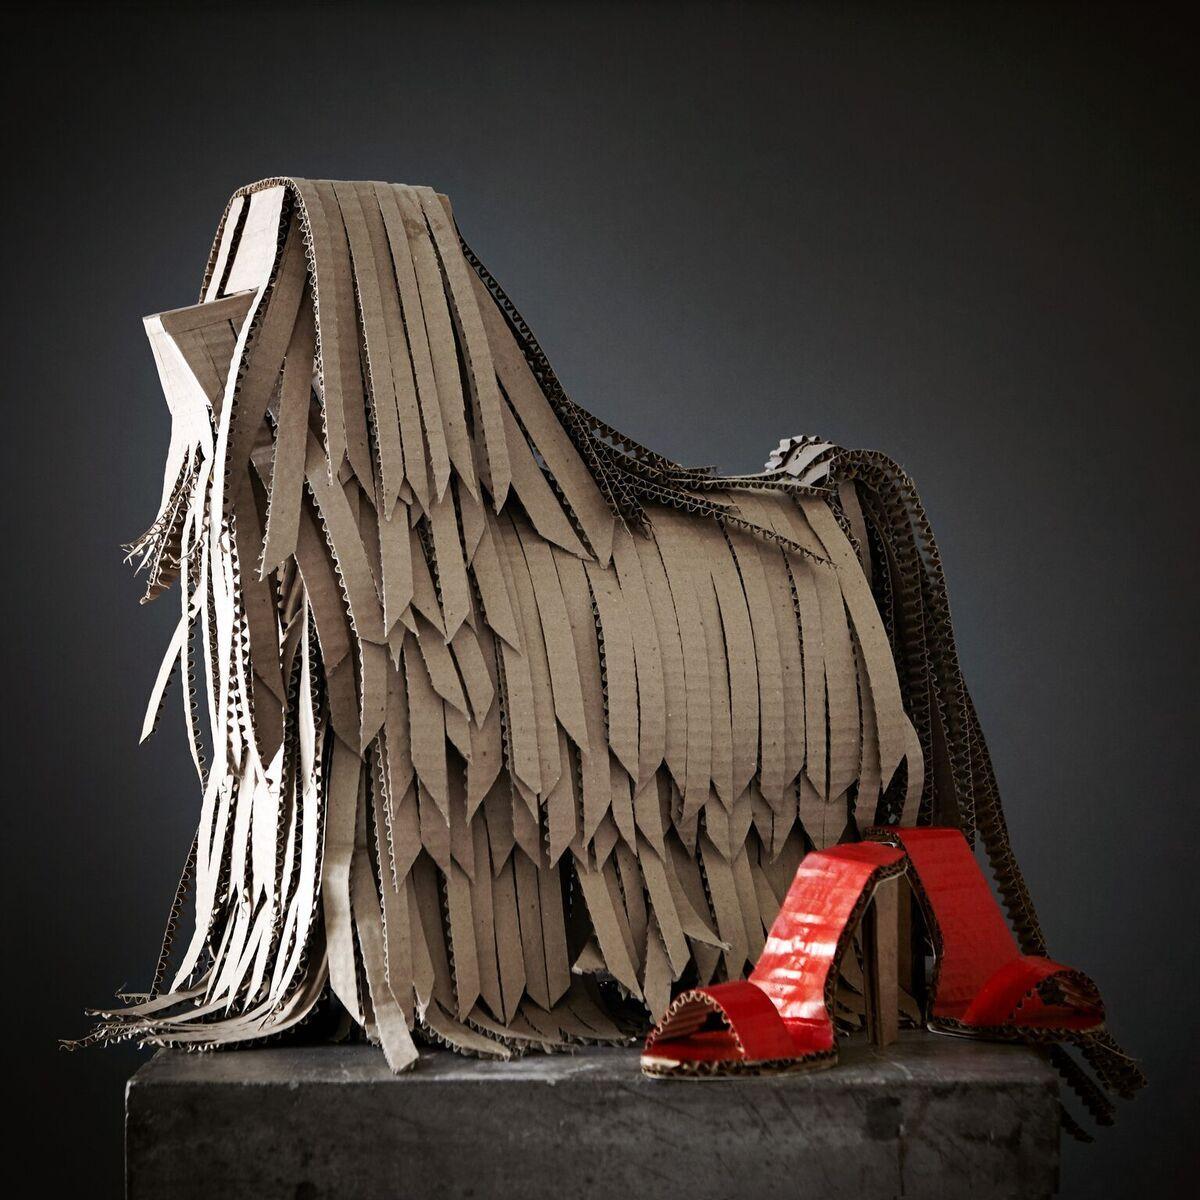 Loran Thrasher Prop Fabrication Cardboard Dogs